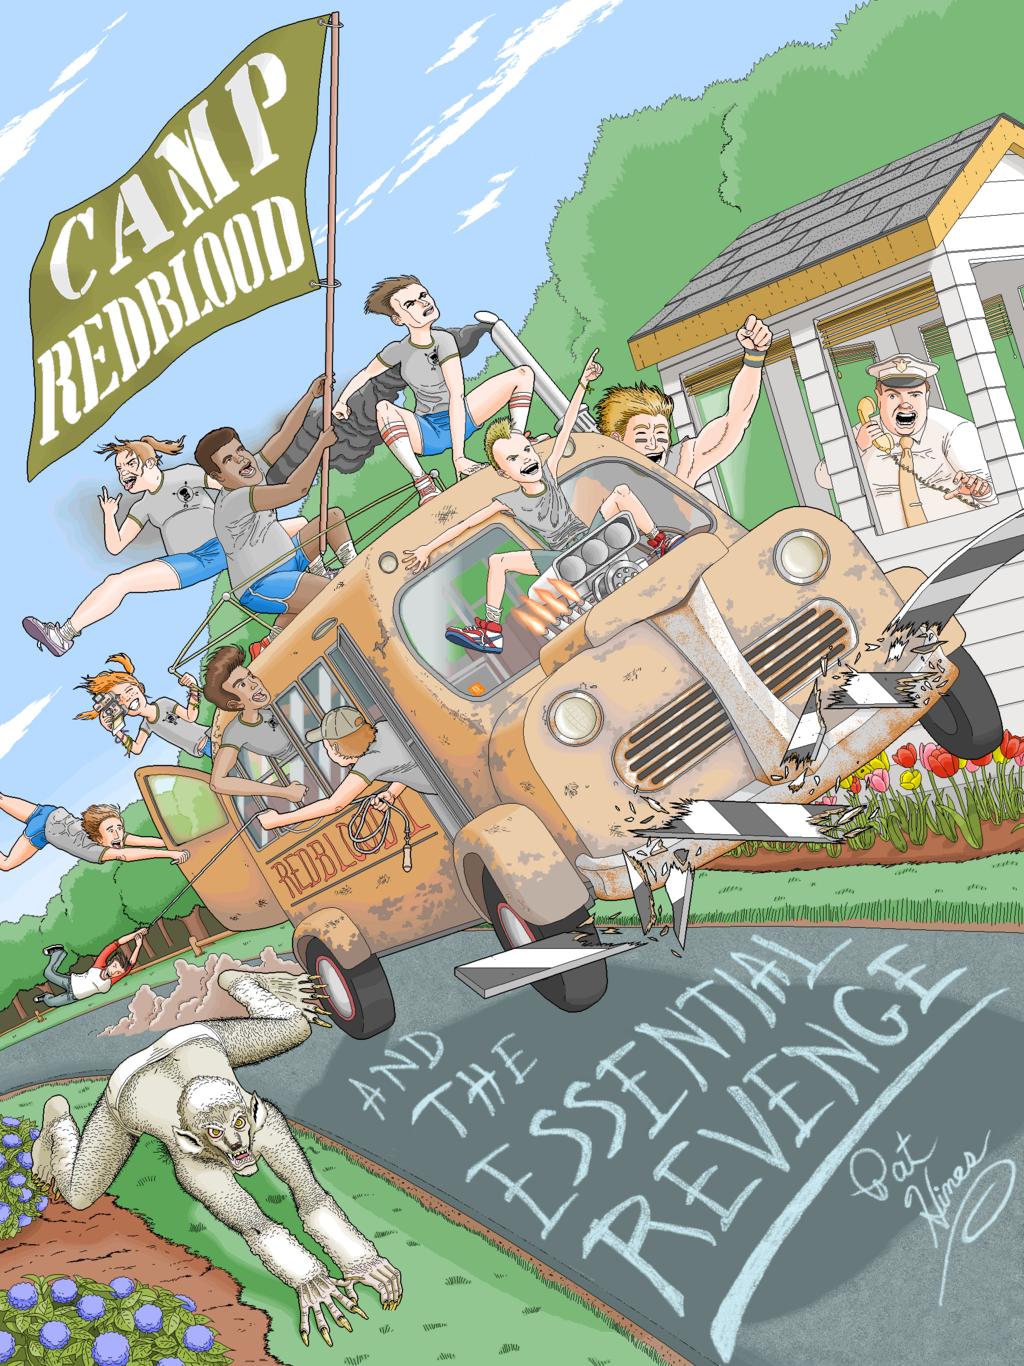 Microsoft Paint Ebook Illustrations Camp Redblood Pat Hines 9